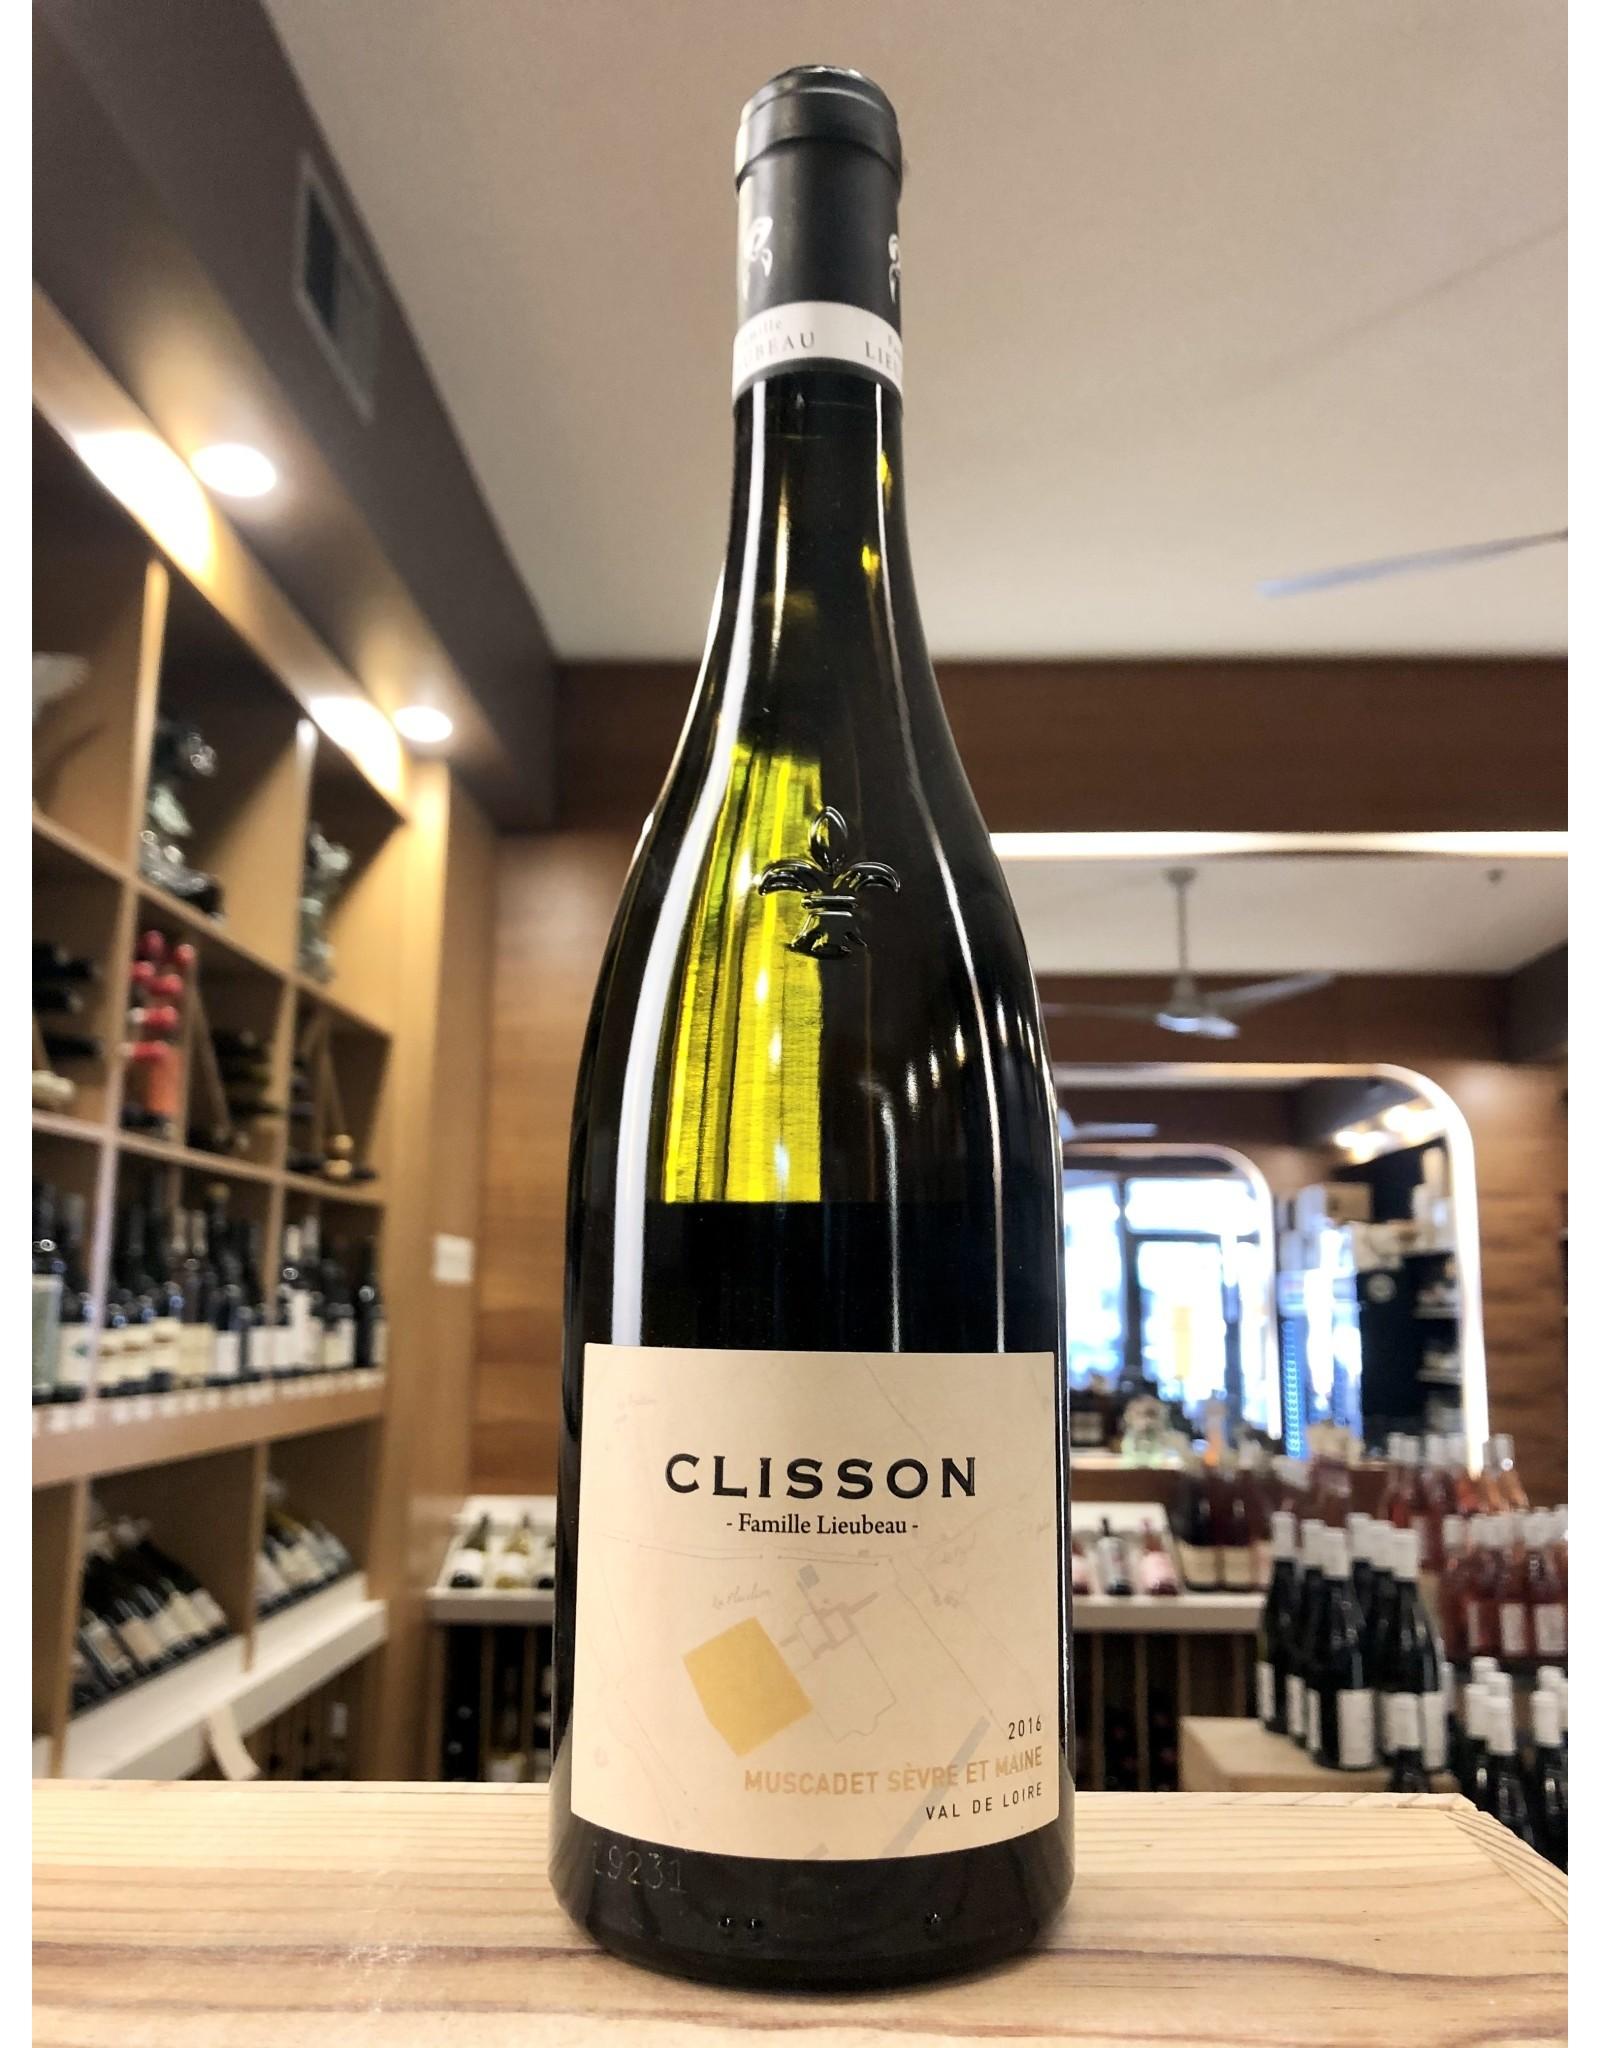 Lieubeau Muscadet Cru Clisson 2016 - 750 ML